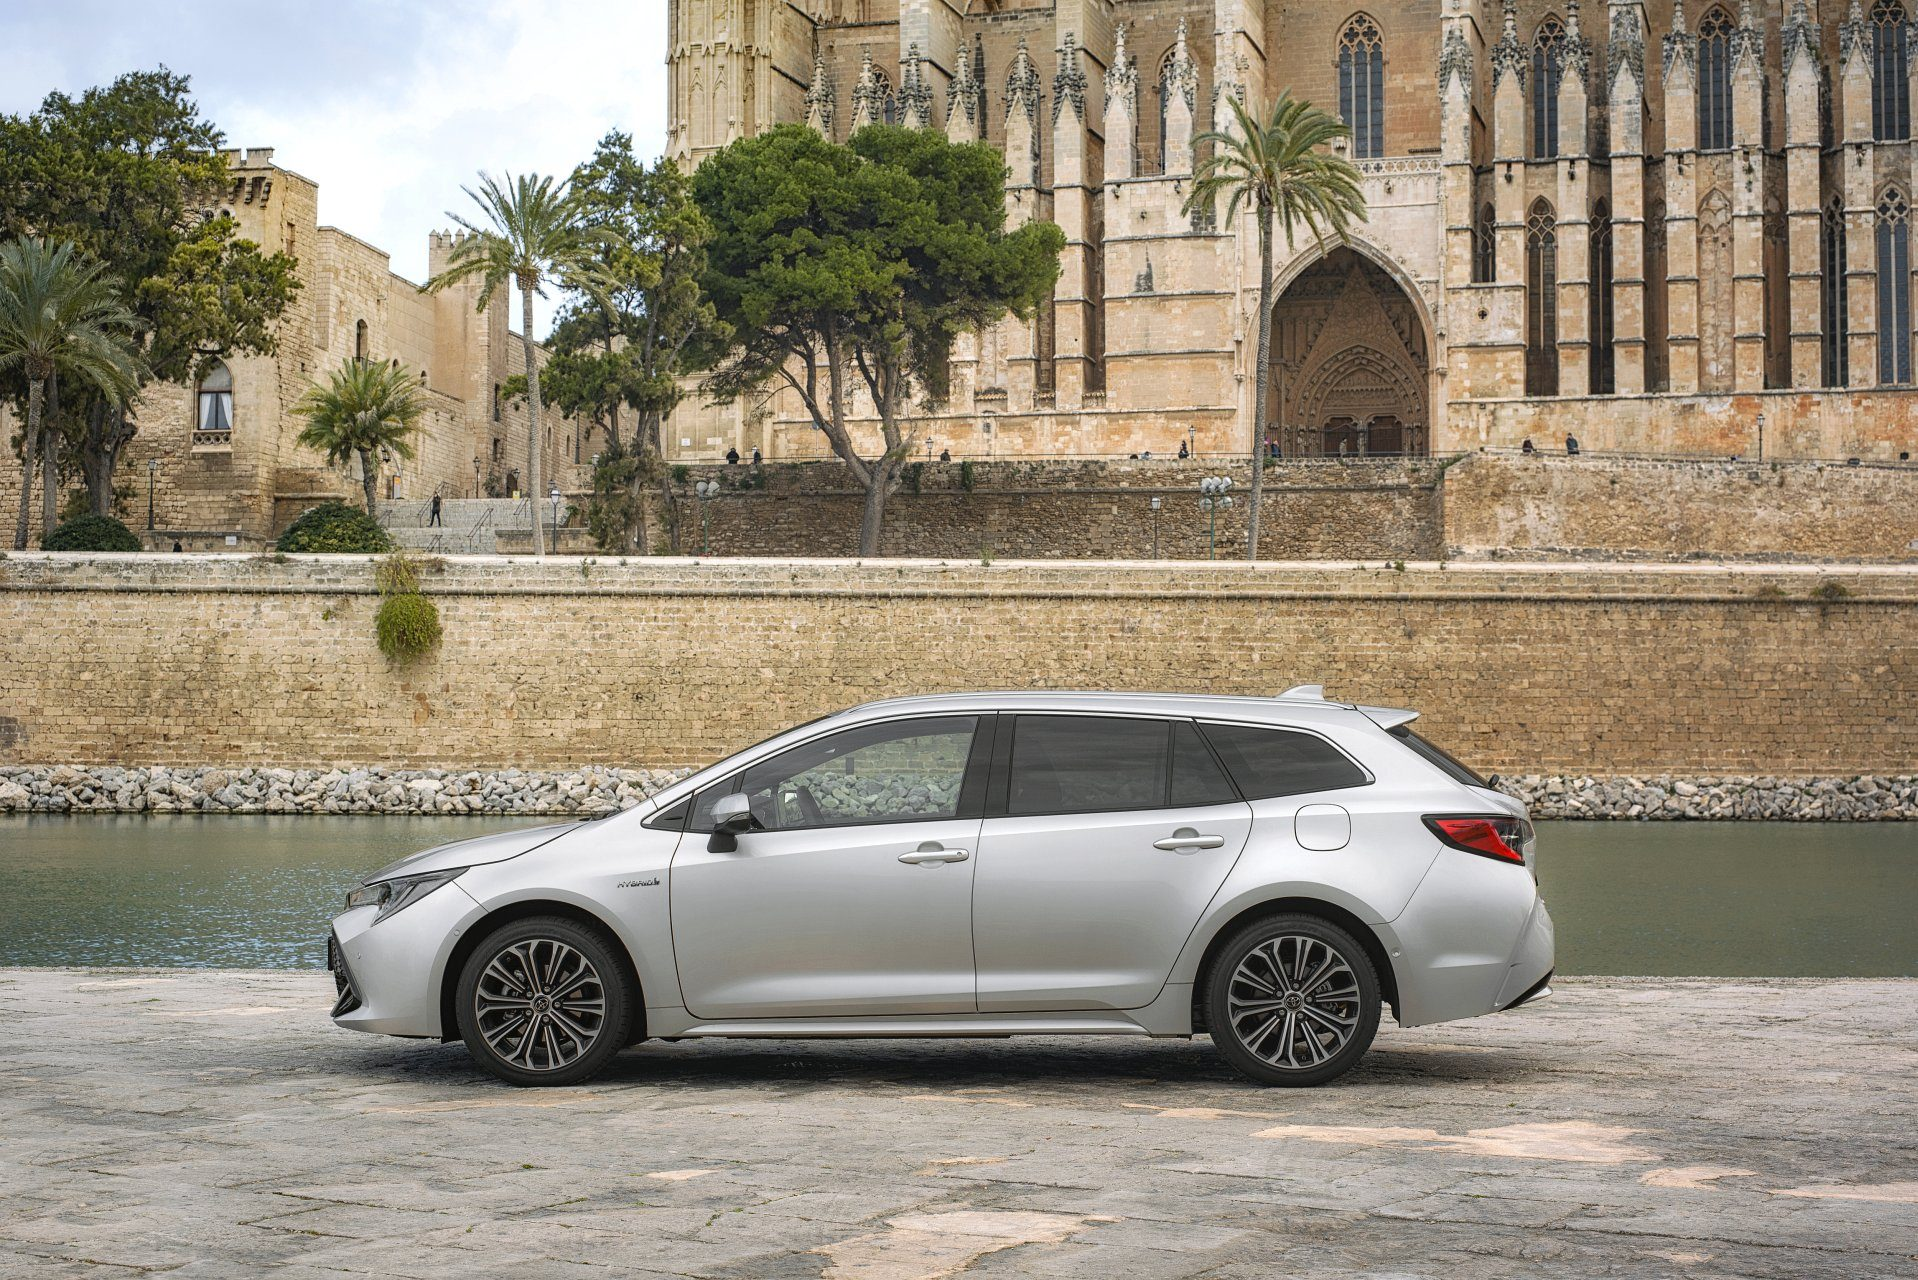 Toyota Corolla универсал вид сбоку